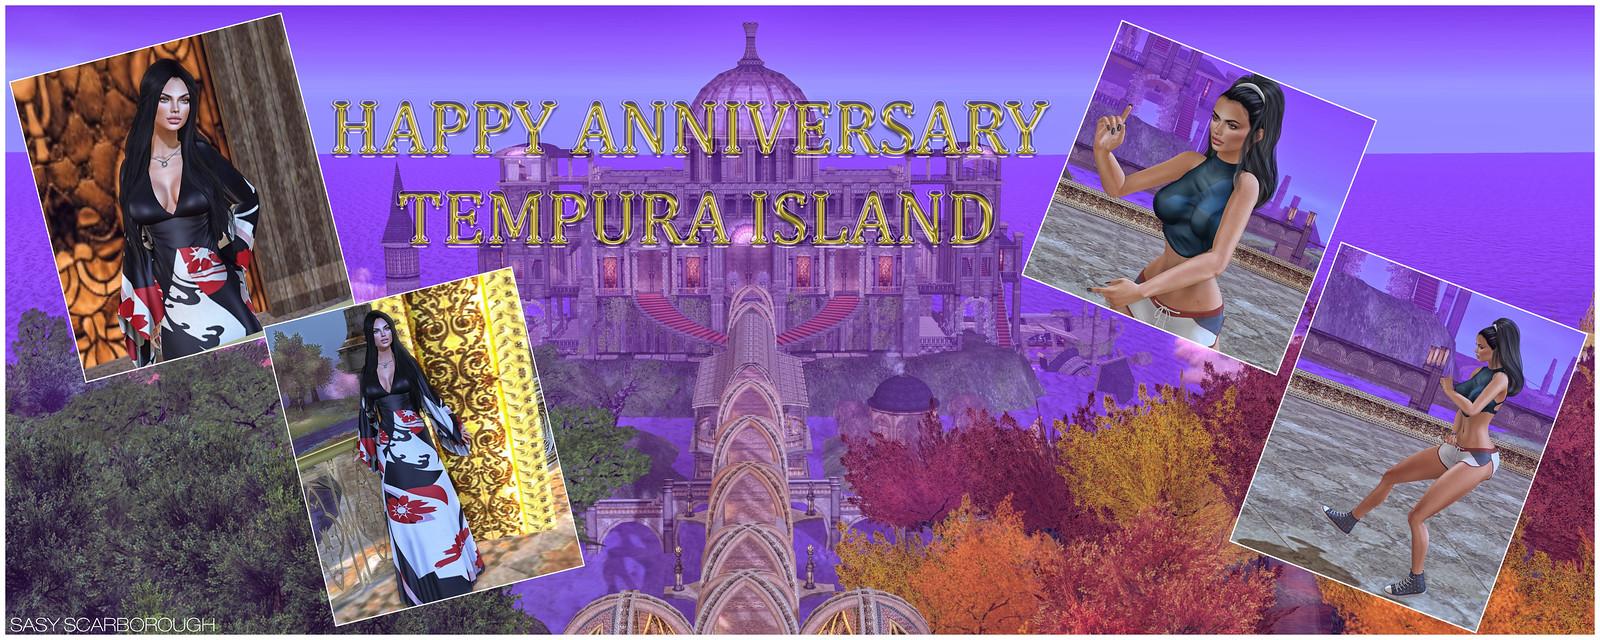 Happy Anniversary Tempura Island